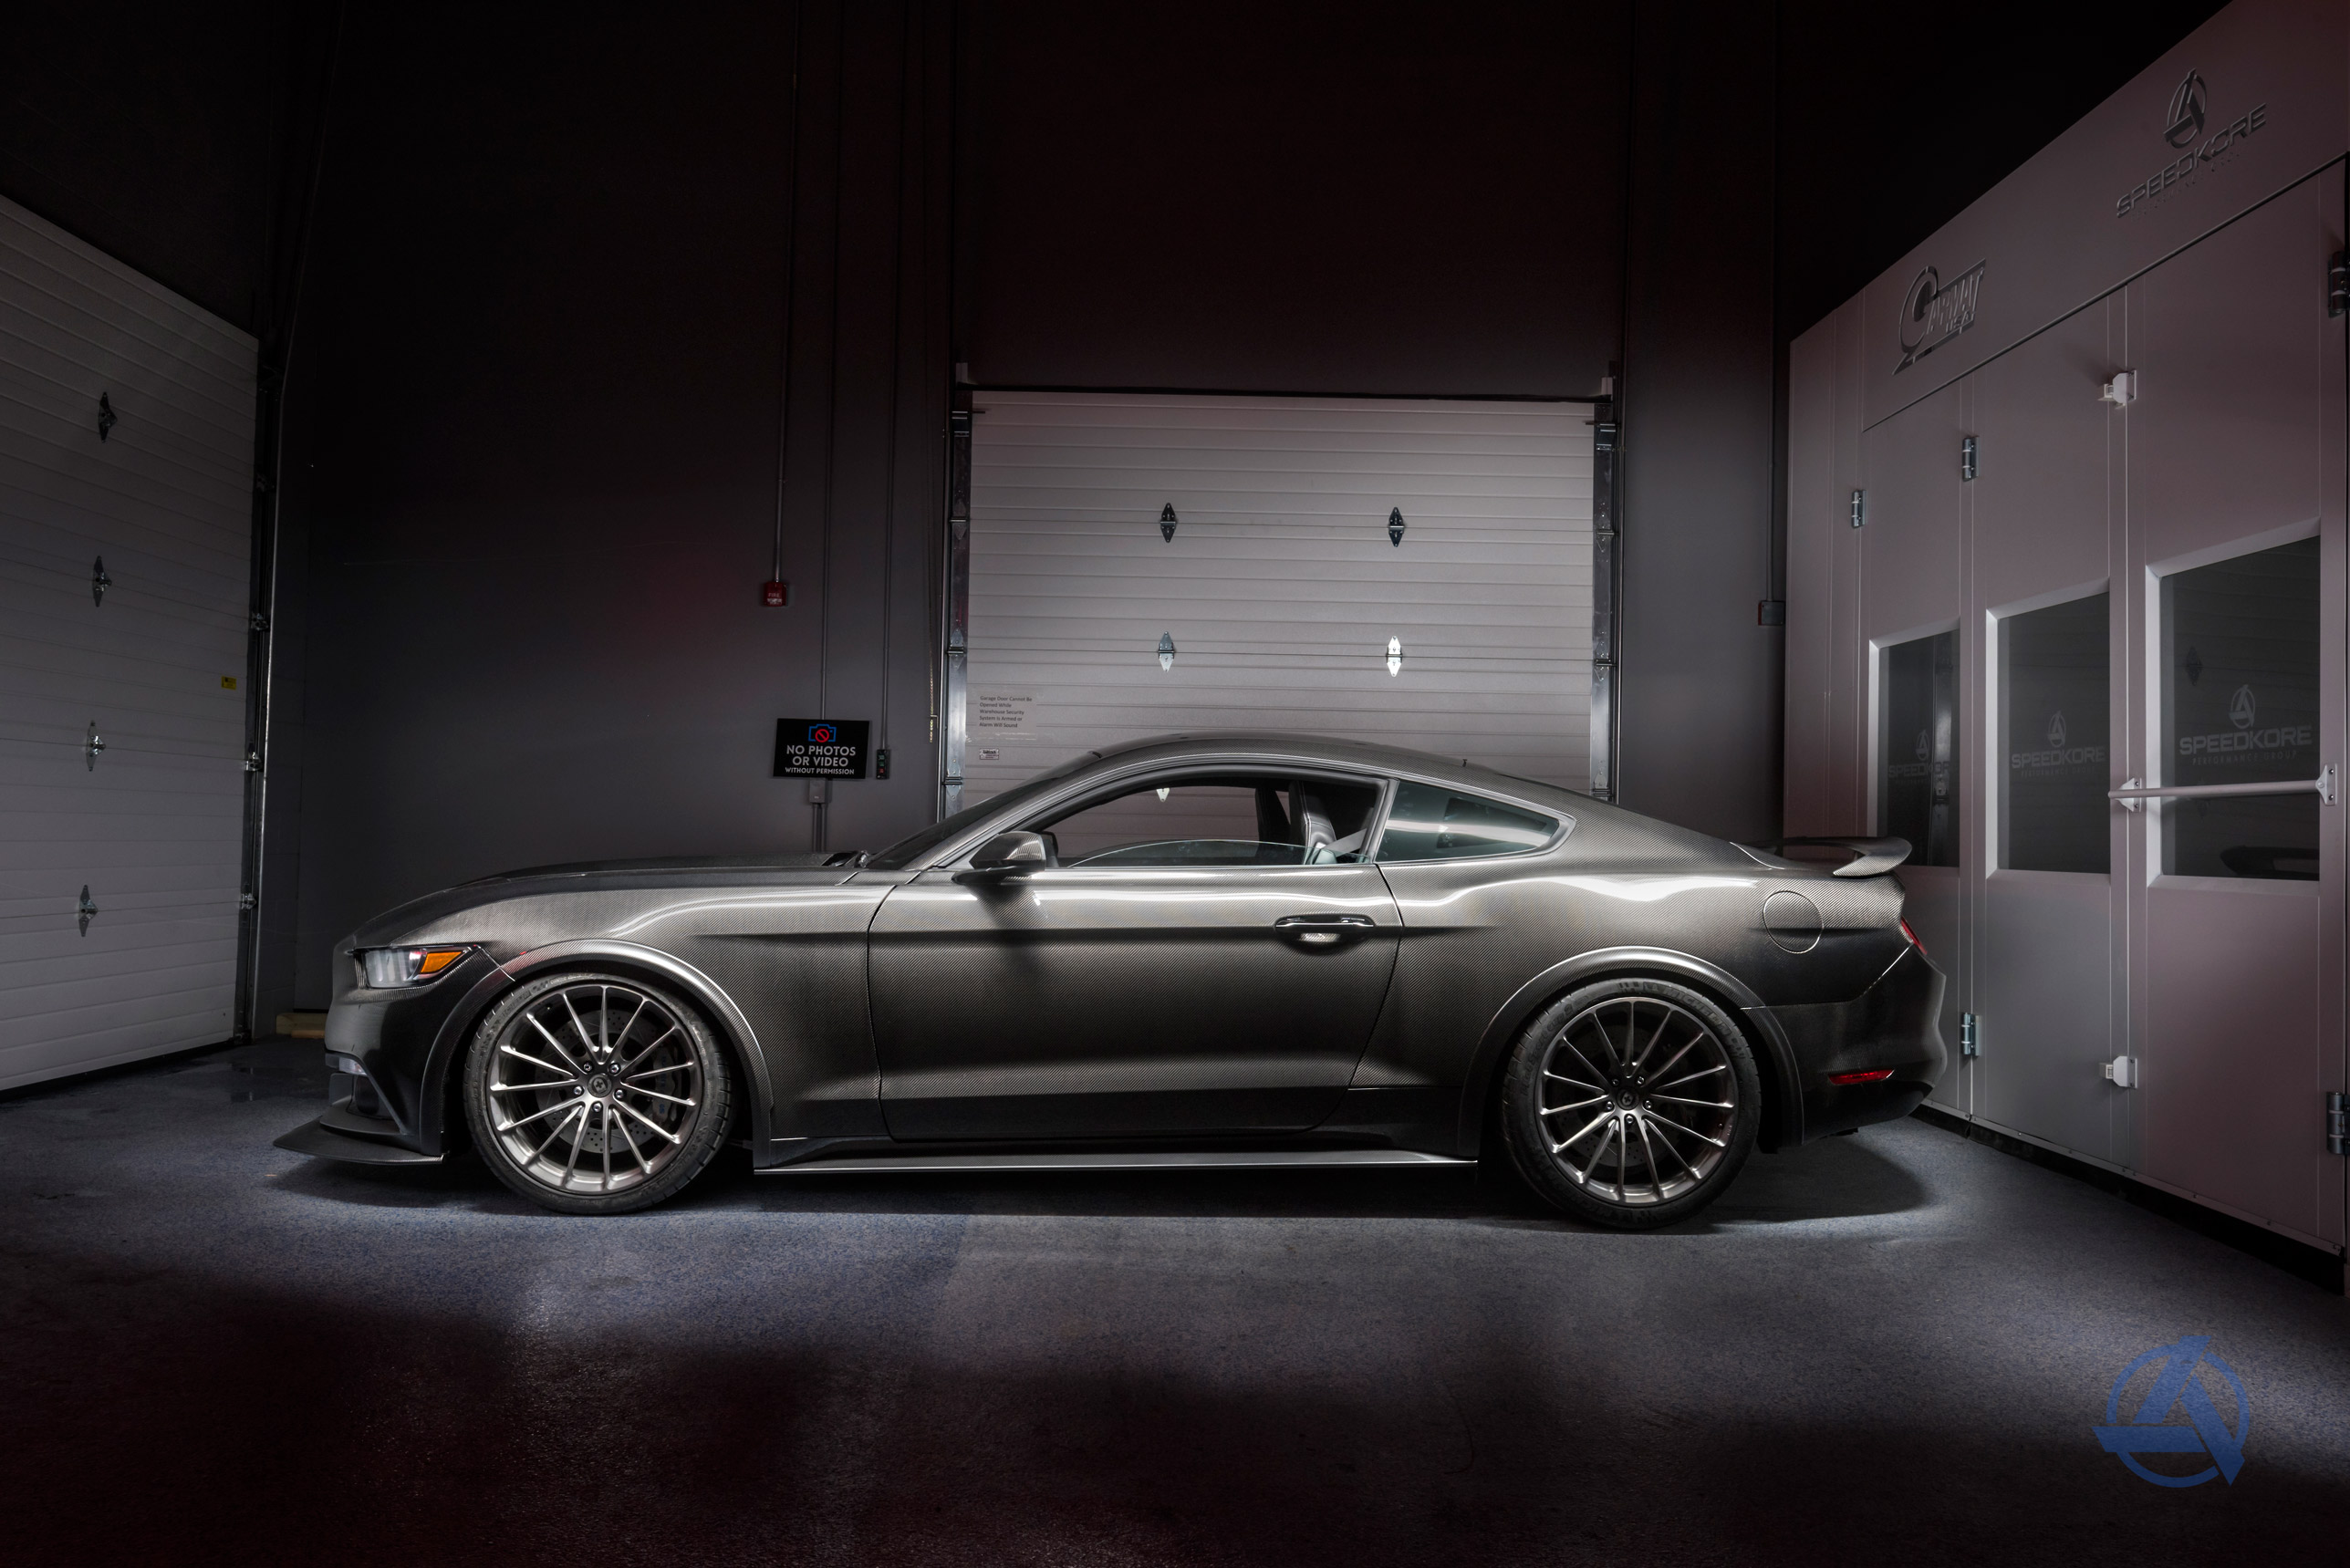 SpeedKore-SK10-Mustang-7-1